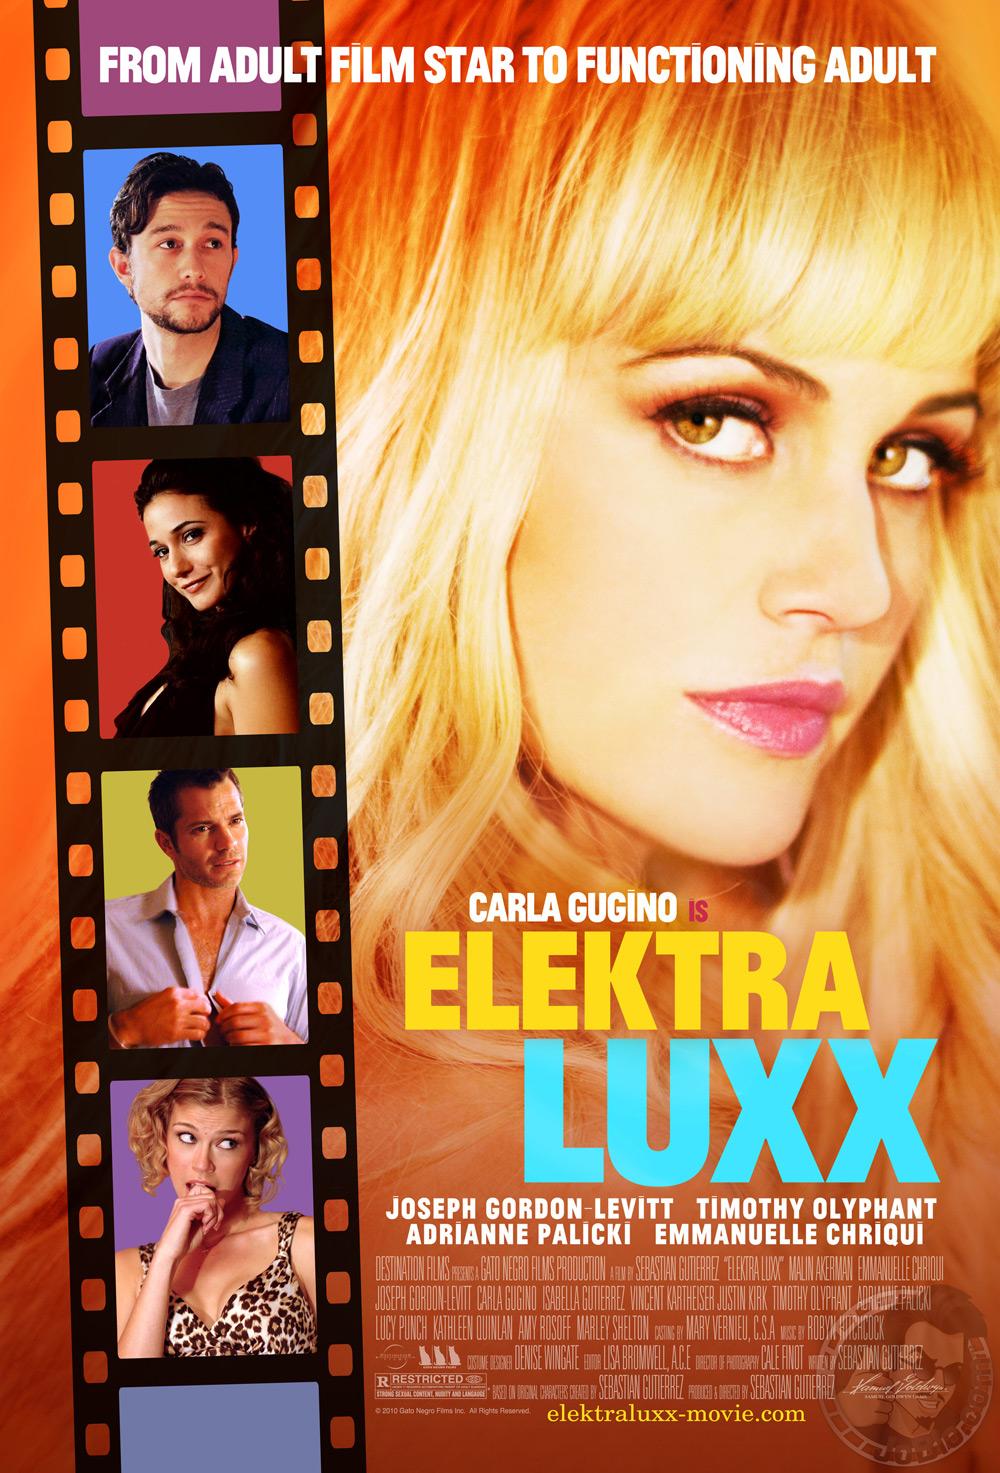 http://4.bp.blogspot.com/-sJxwzsw3RJM/ThaHrYGQ68I/AAAAAAAAAVA/kj-lwMXt5x0/s1600/Elektra-Luxx-Poster.jpg